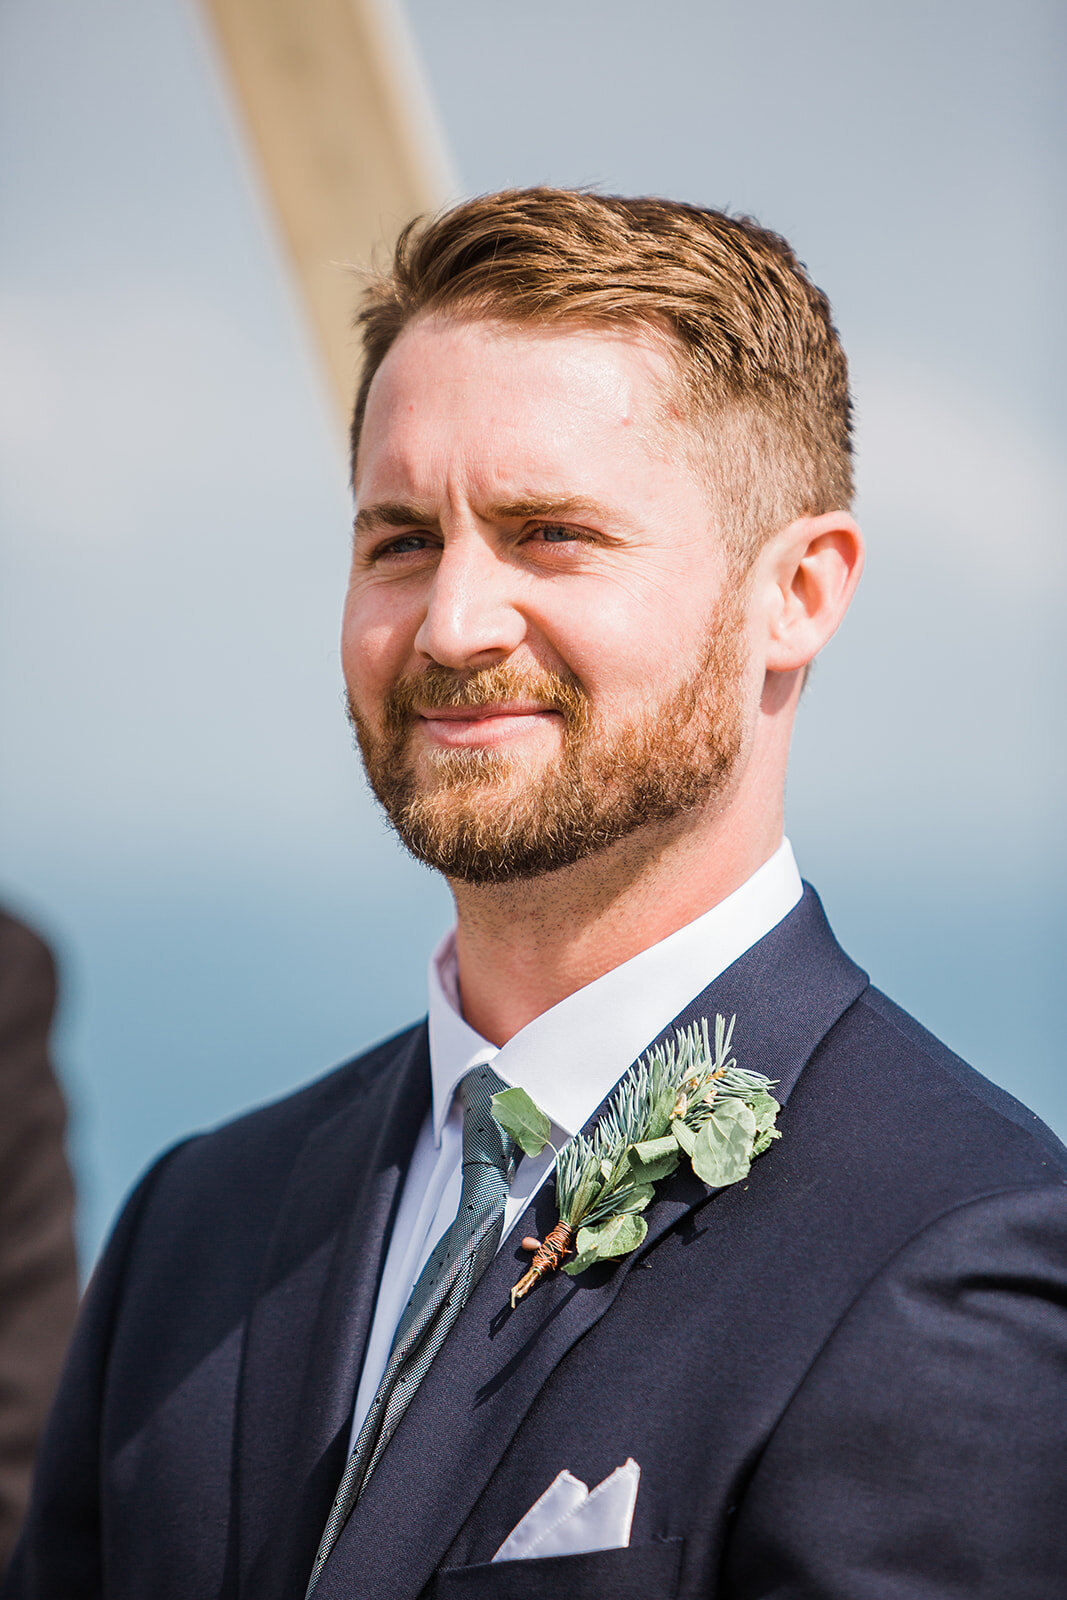 groom first look with bride spokane wedding